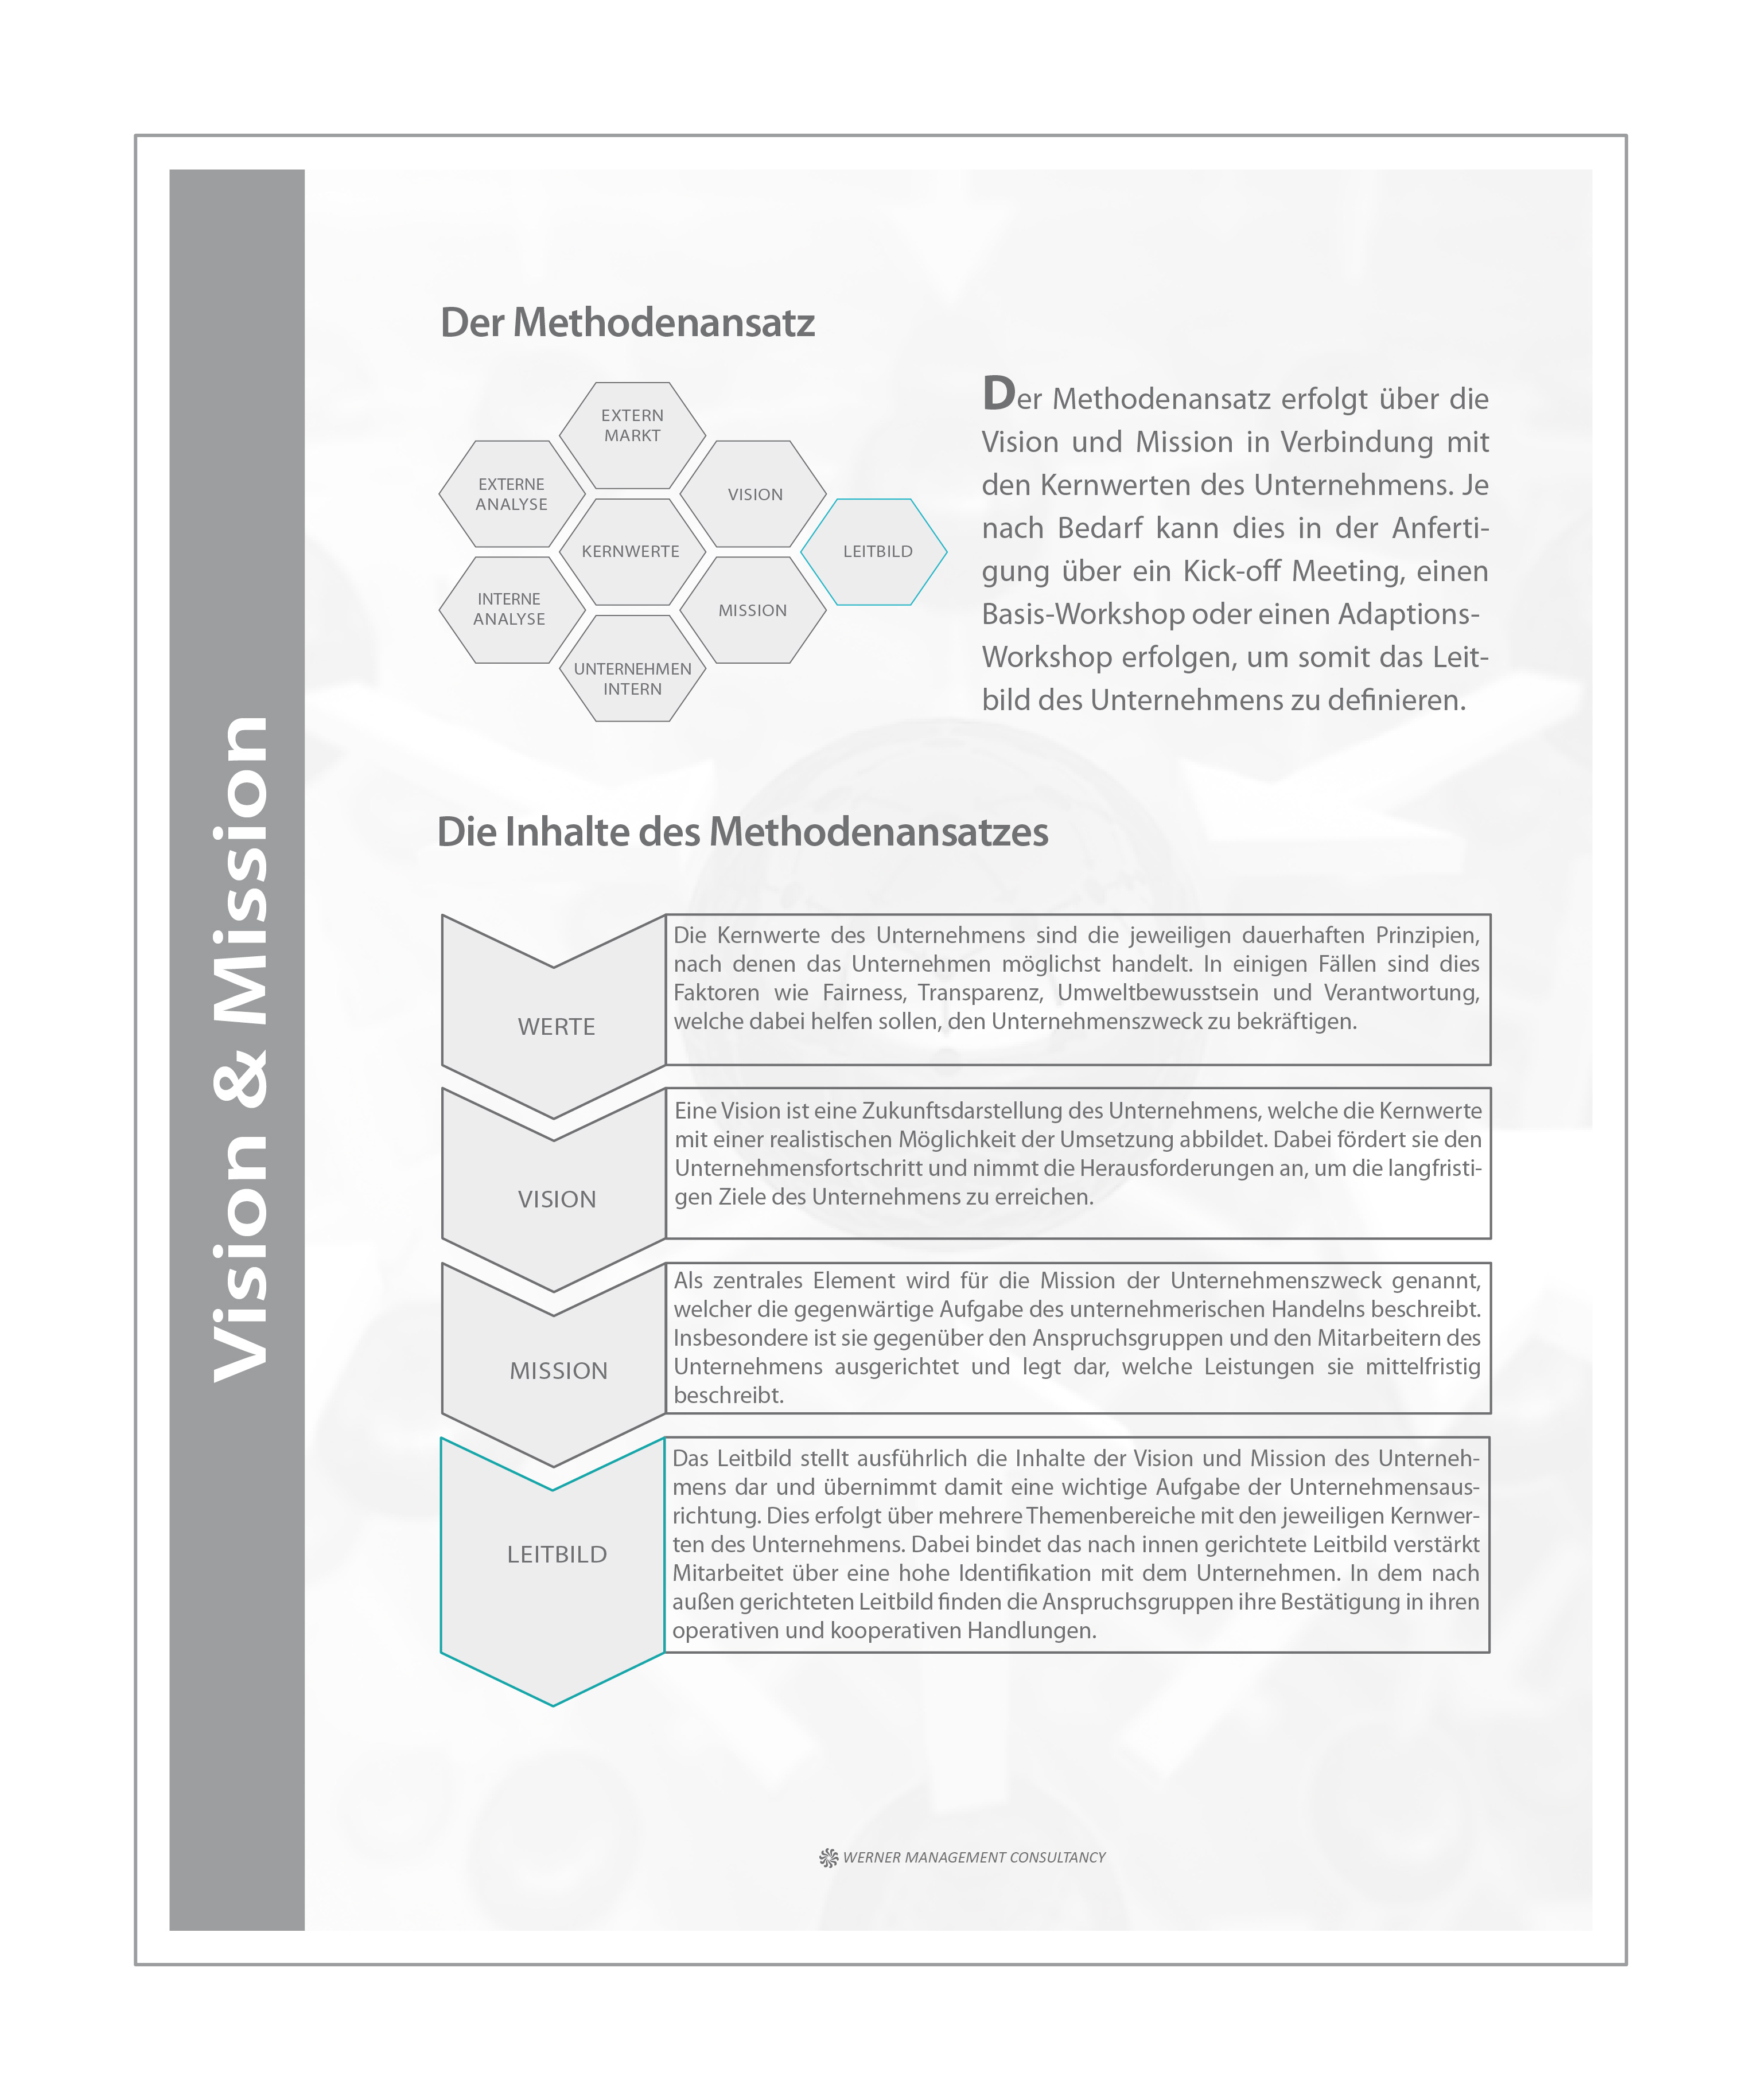 WMC Broschüre Business Development Phase-1 Methode